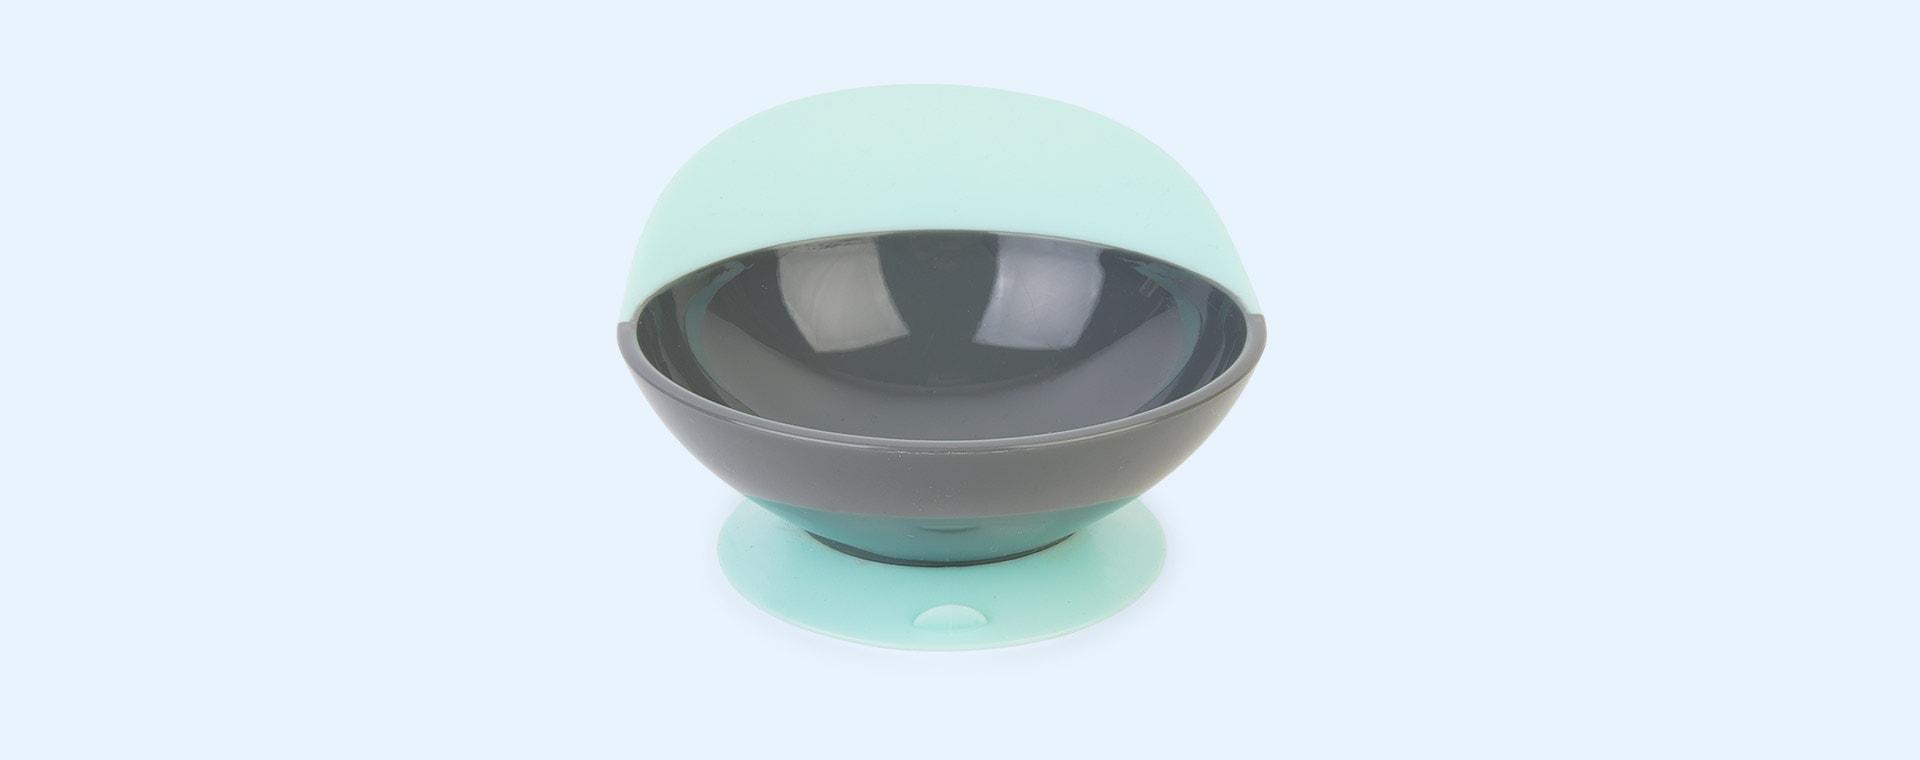 Mint Boon Catch Bowl